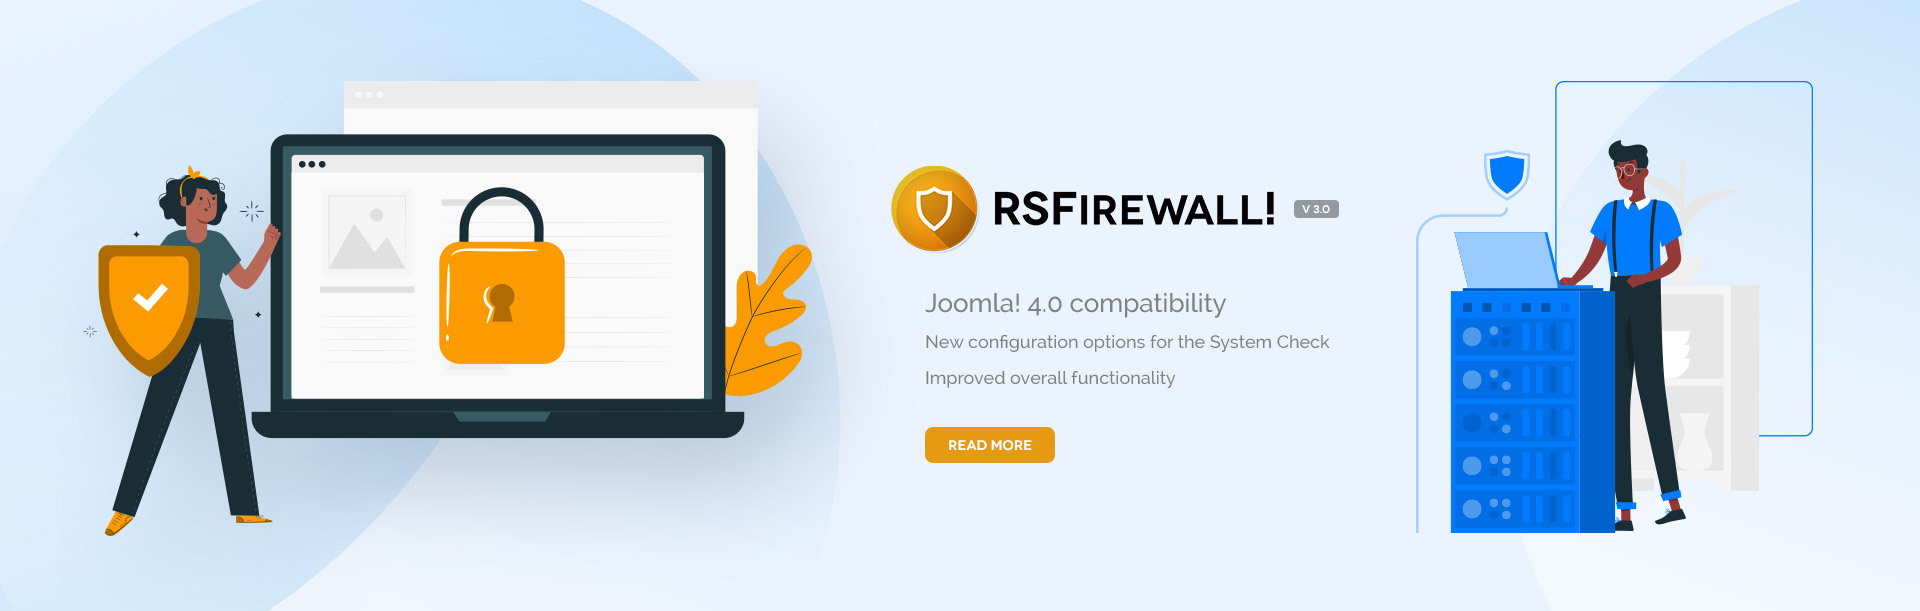 RSFirewall! 3.0